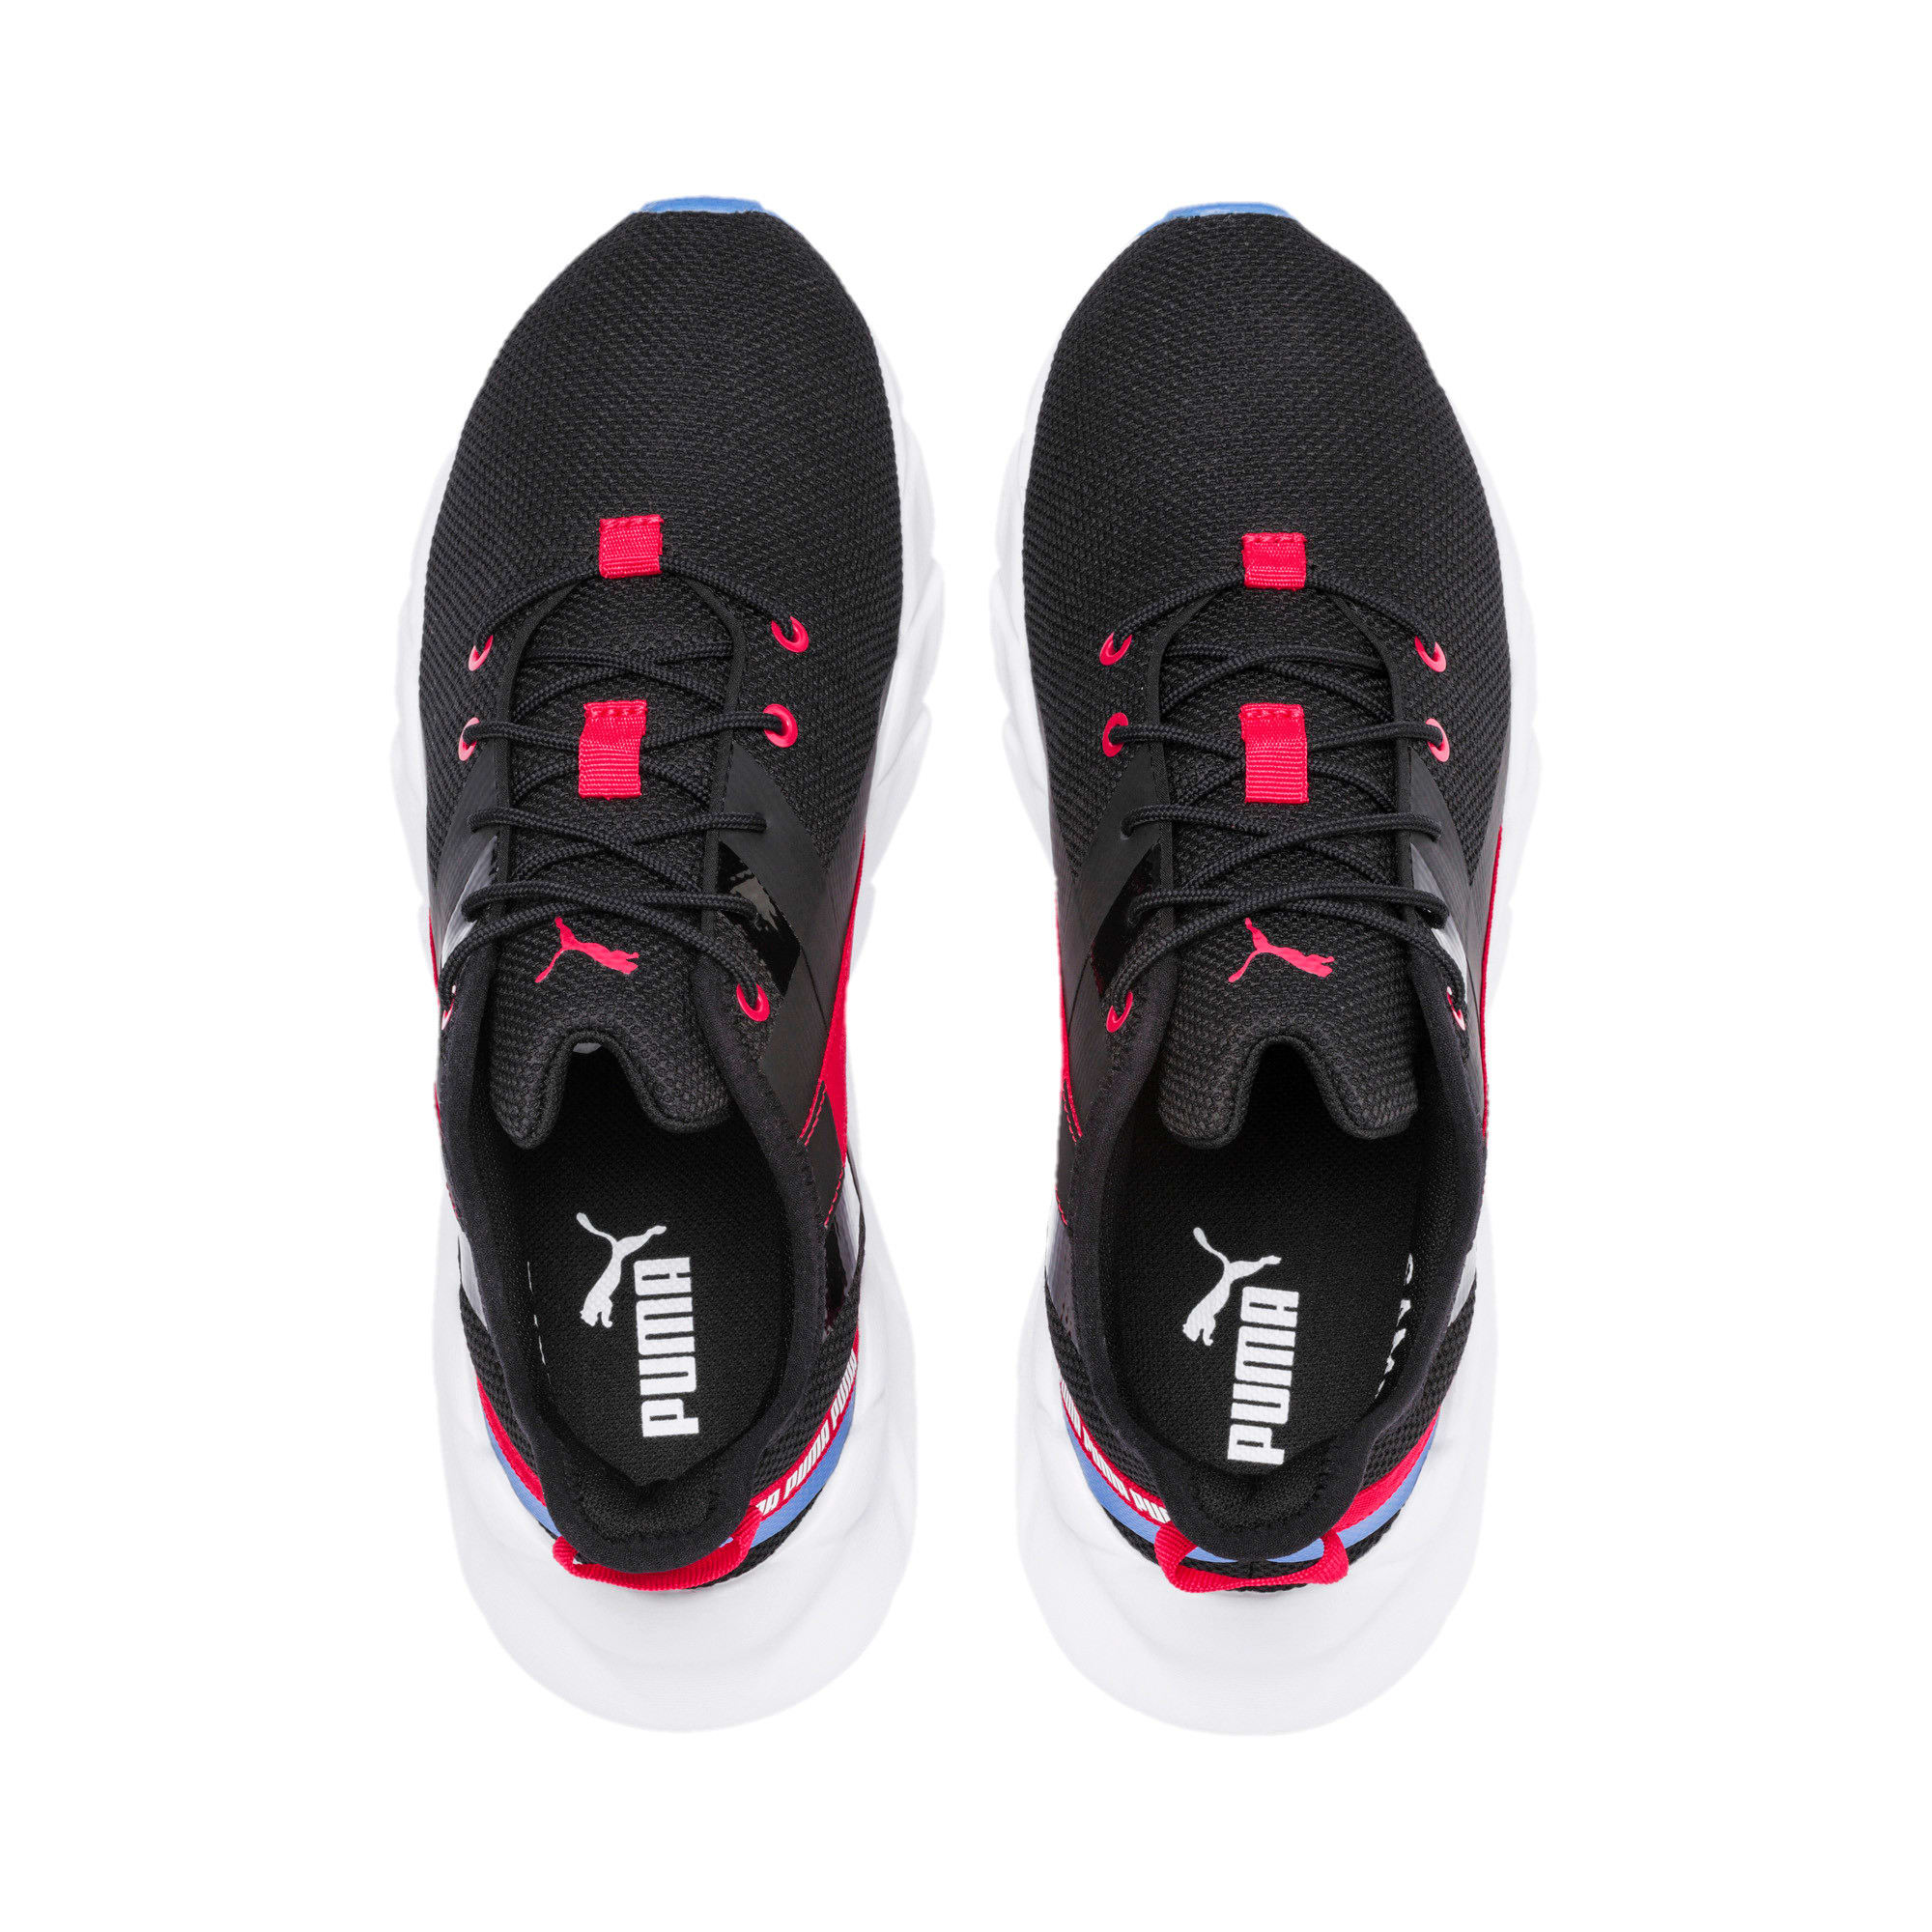 Thumbnail 8 of Damskie buty treningowe Weave XT Shift, Puma Black-Nrgy Rose, medium